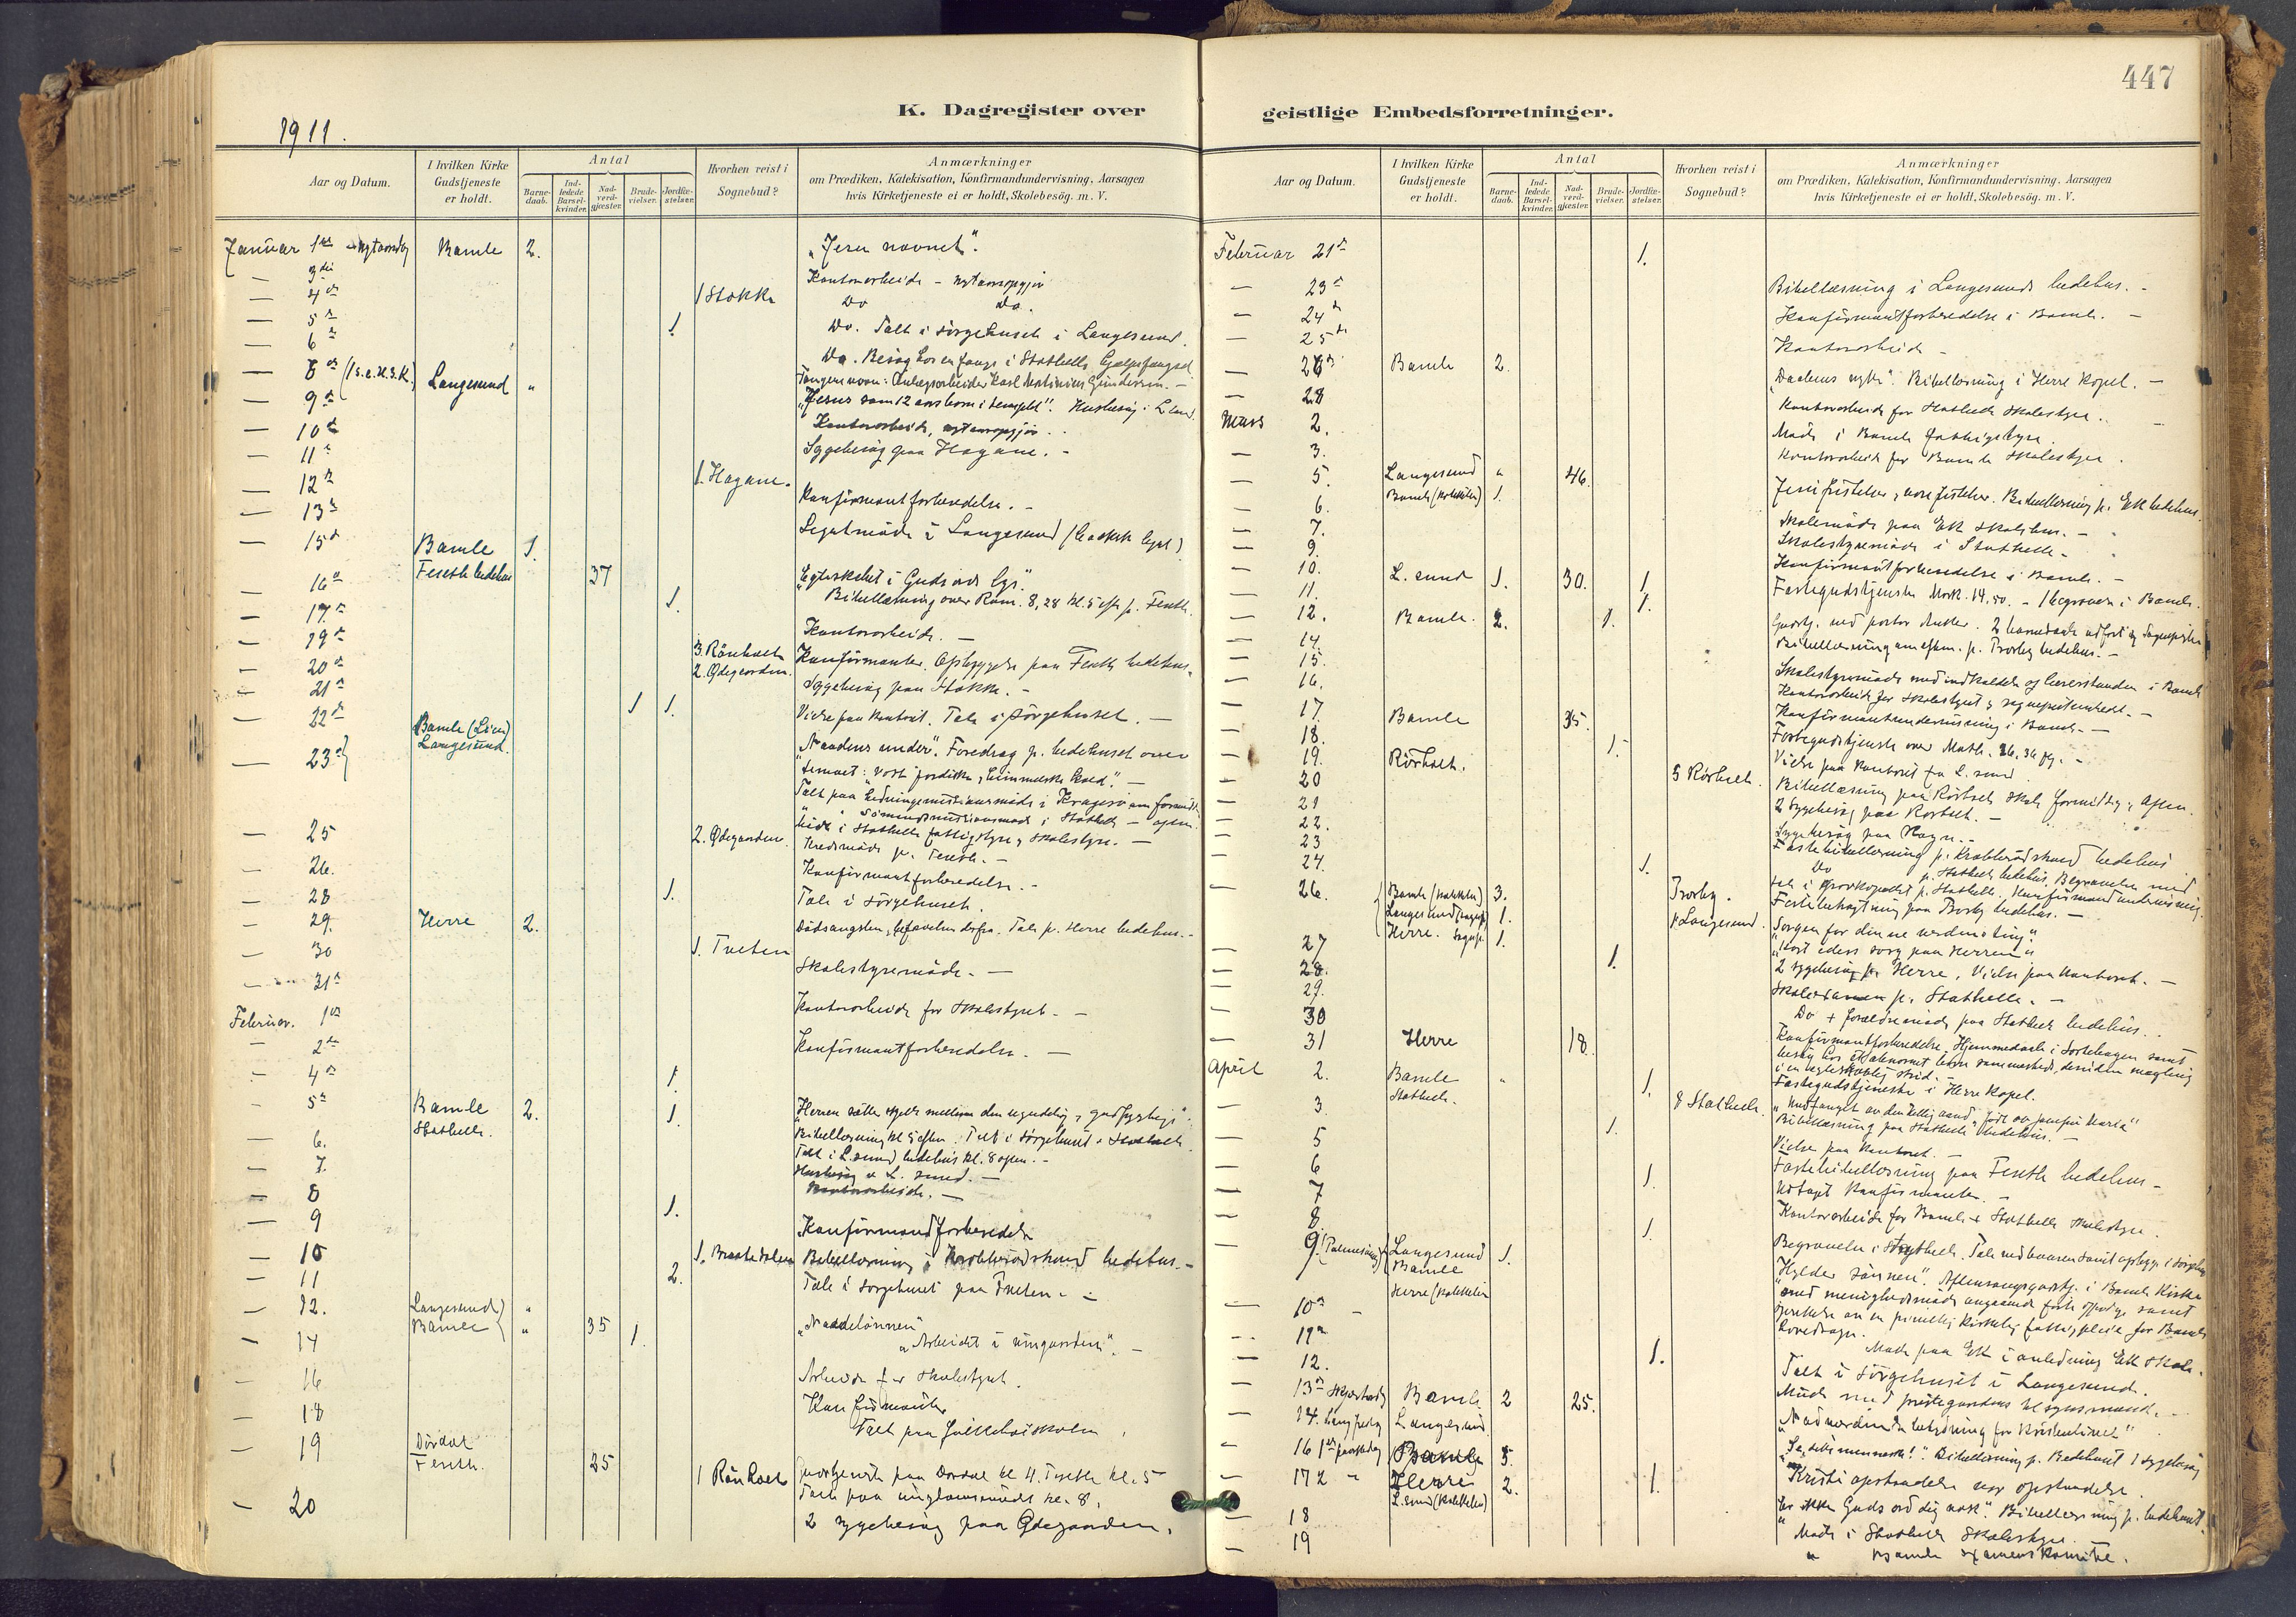 SAKO, Bamble kirkebøker, F/Fa/L0009: Ministerialbok nr. I 9, 1901-1917, s. 447